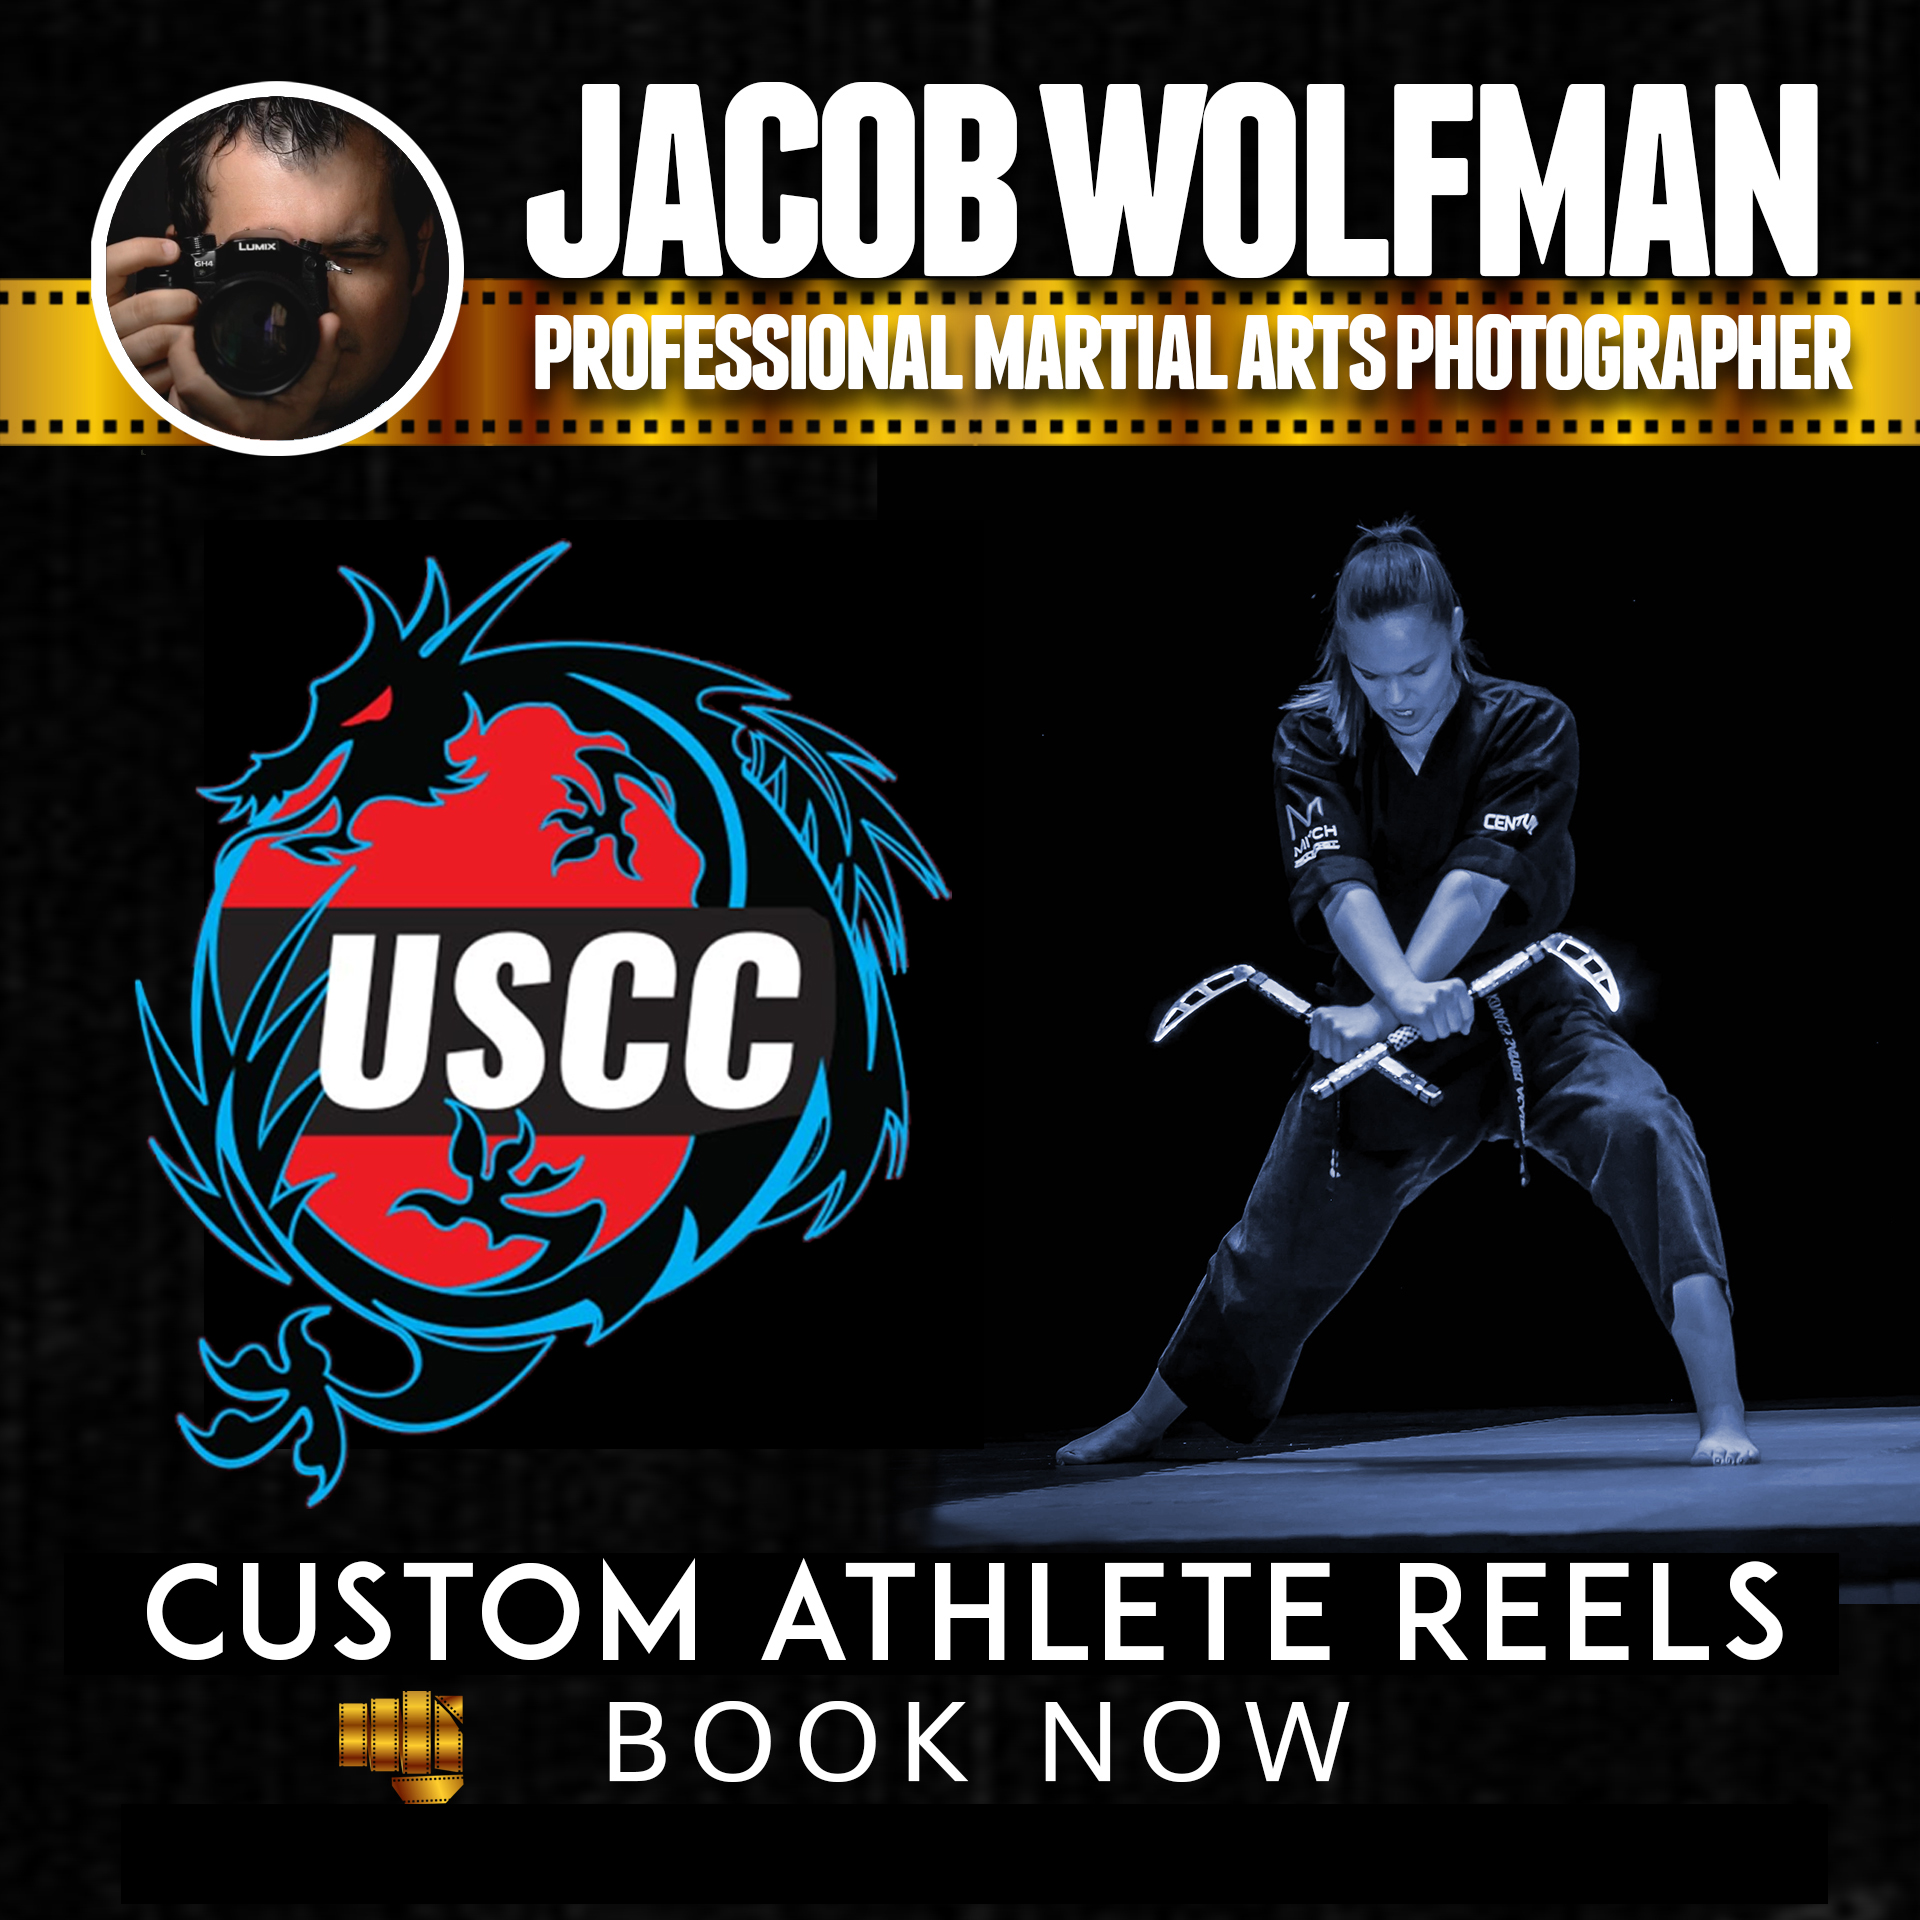 USCC_Martial Studios_square flyer.jpg